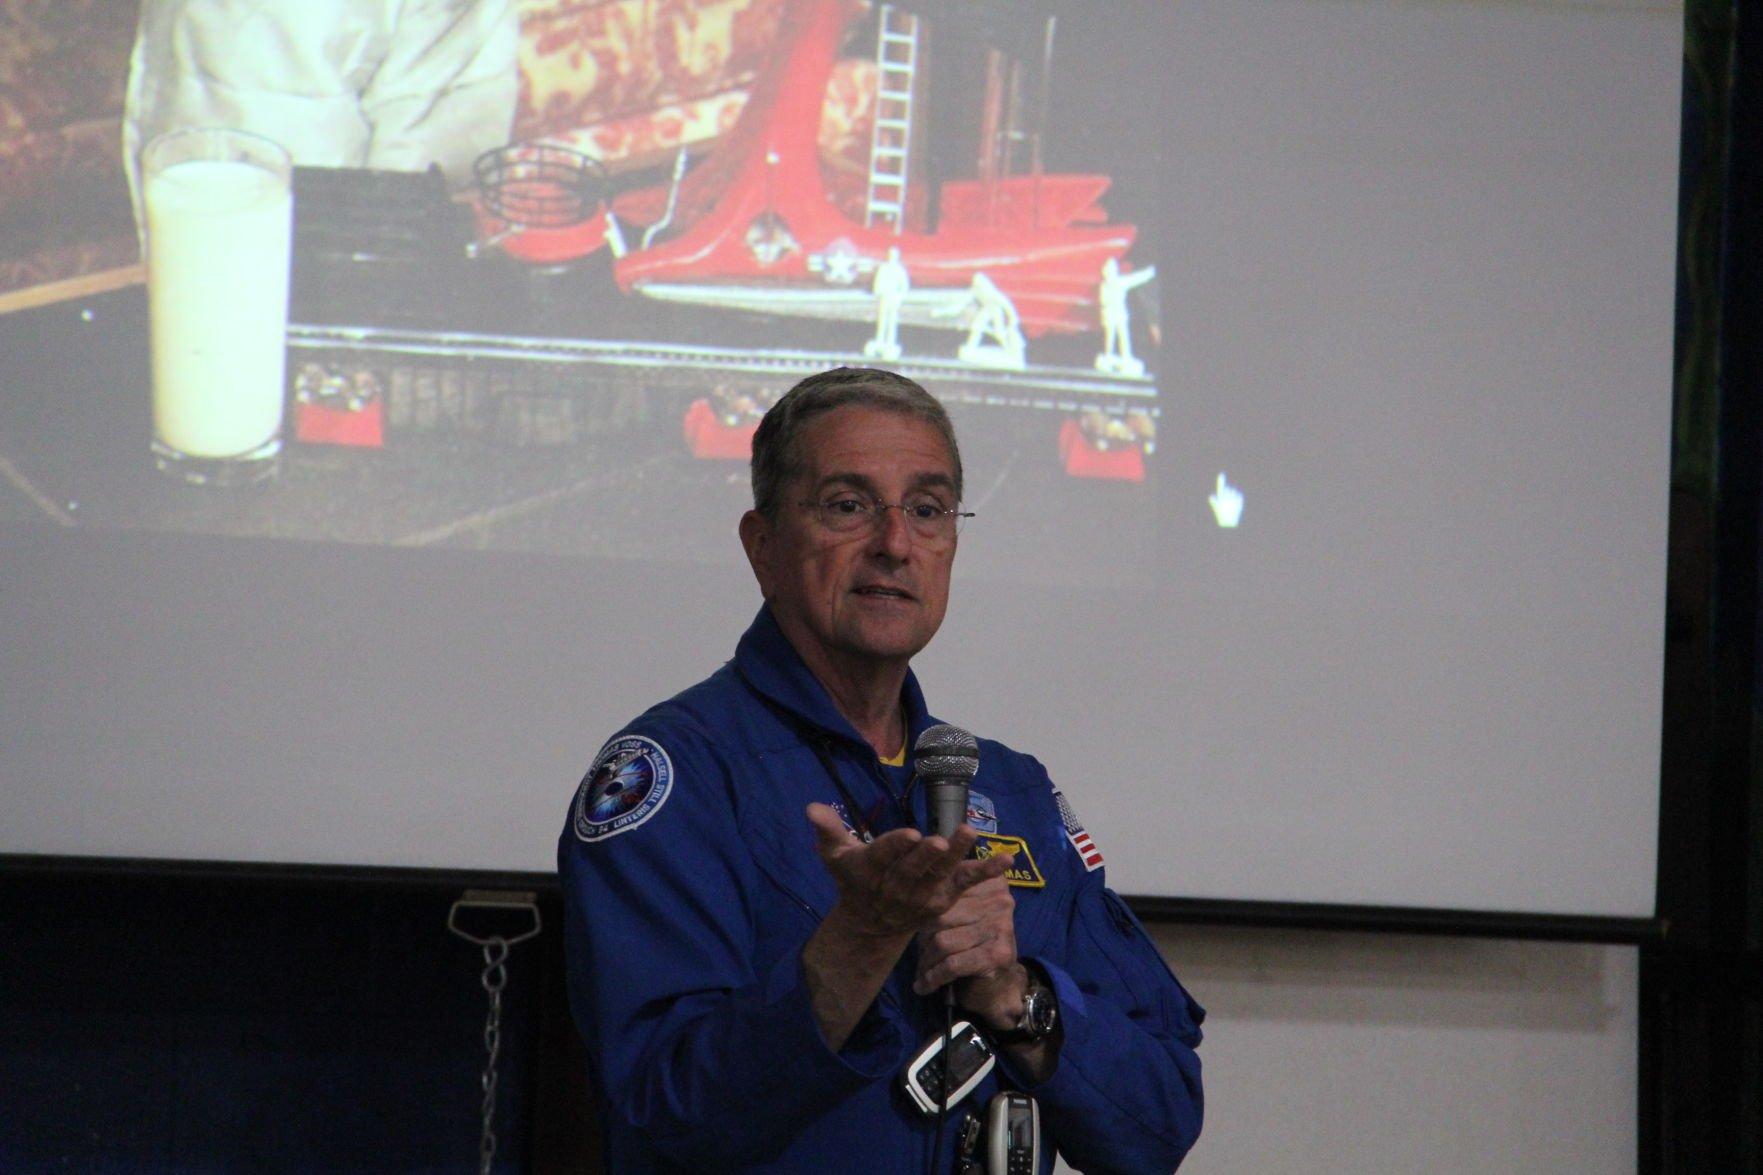 Lexington Elementary students hear from Ohio astronaut